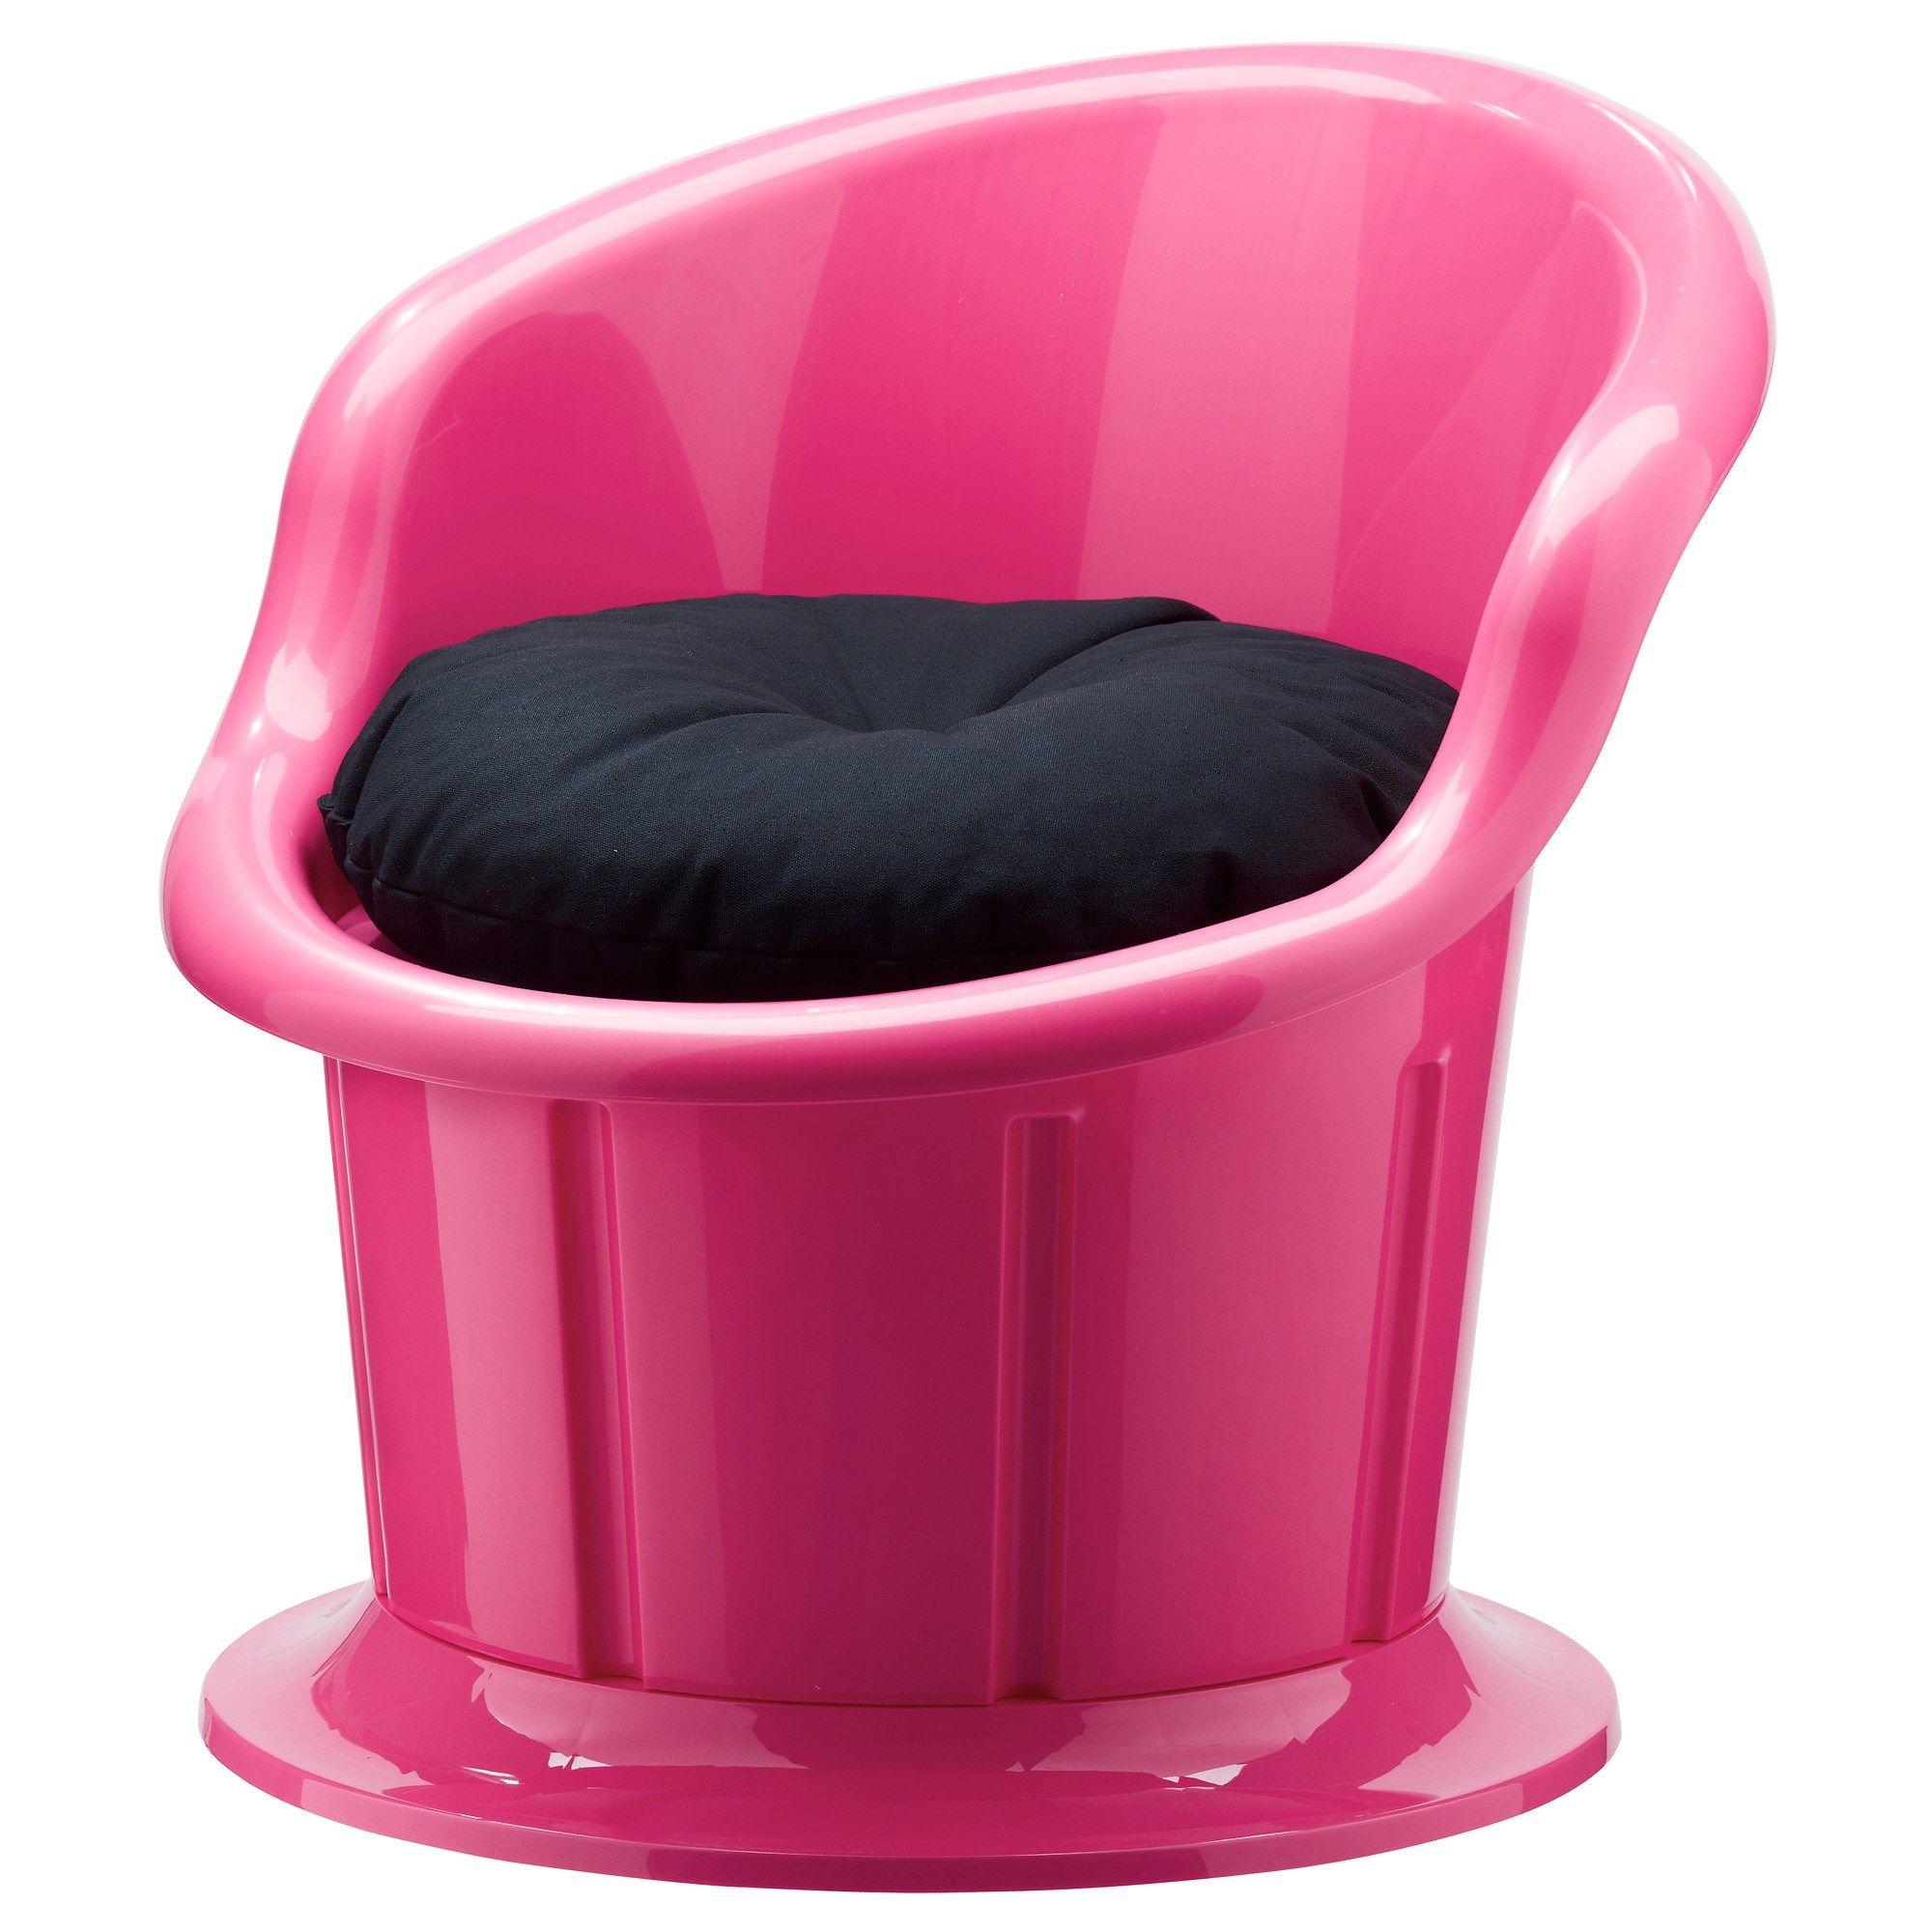 Popptorp Tekli Koltuk Pembe Siyah Ikea Oturma Odalari Ikea Fikirleri Oturma Odalari Tekli Koltuk